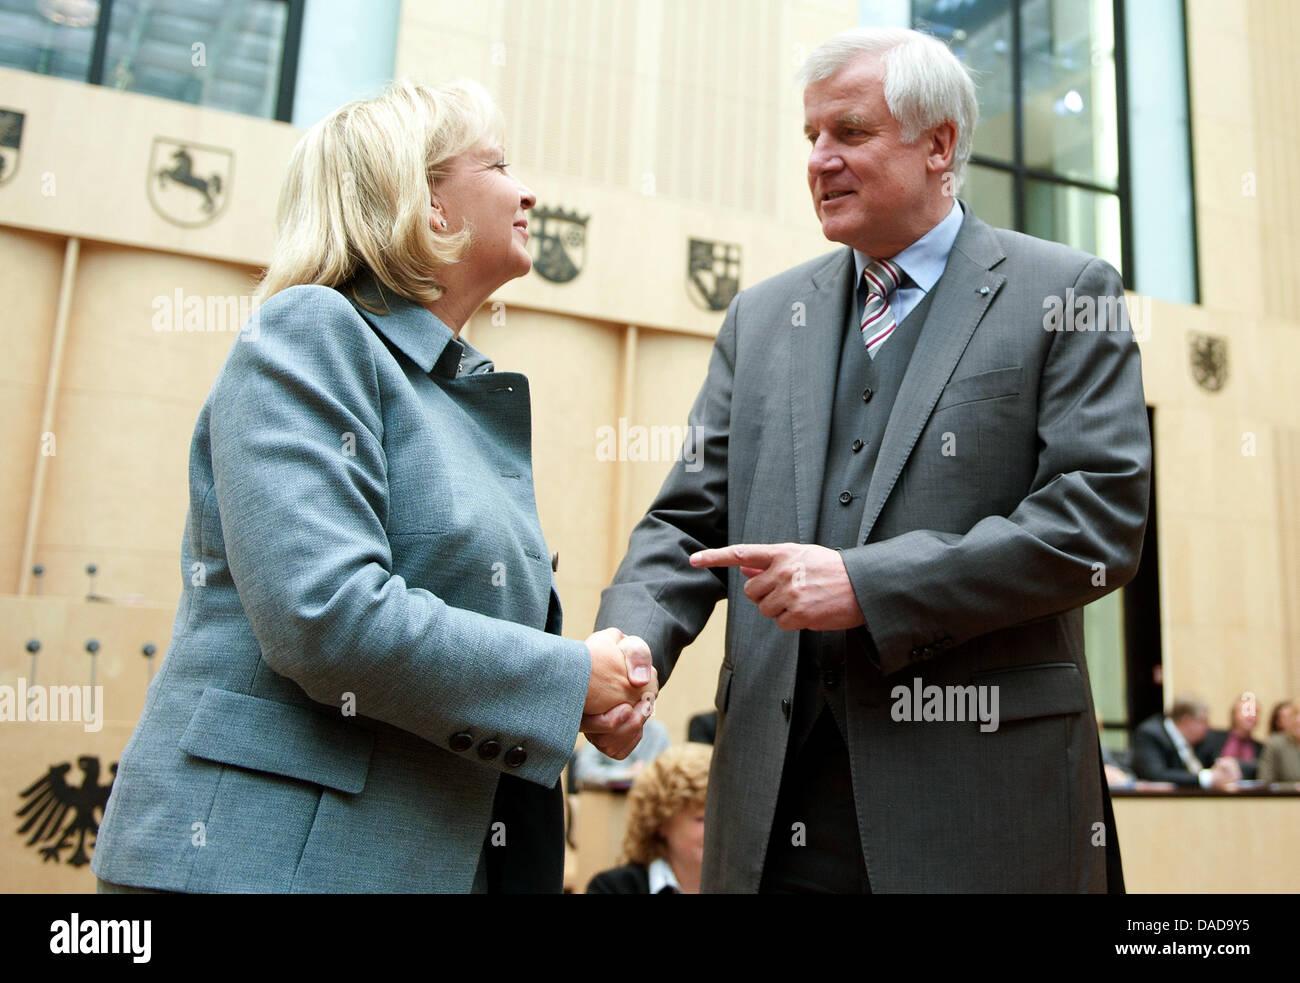 North-Rhine Westphalian Prime Minister Hannelore Kraft congratulates Bavarian Prime Minister Horst Seehofer on his - Stock Image